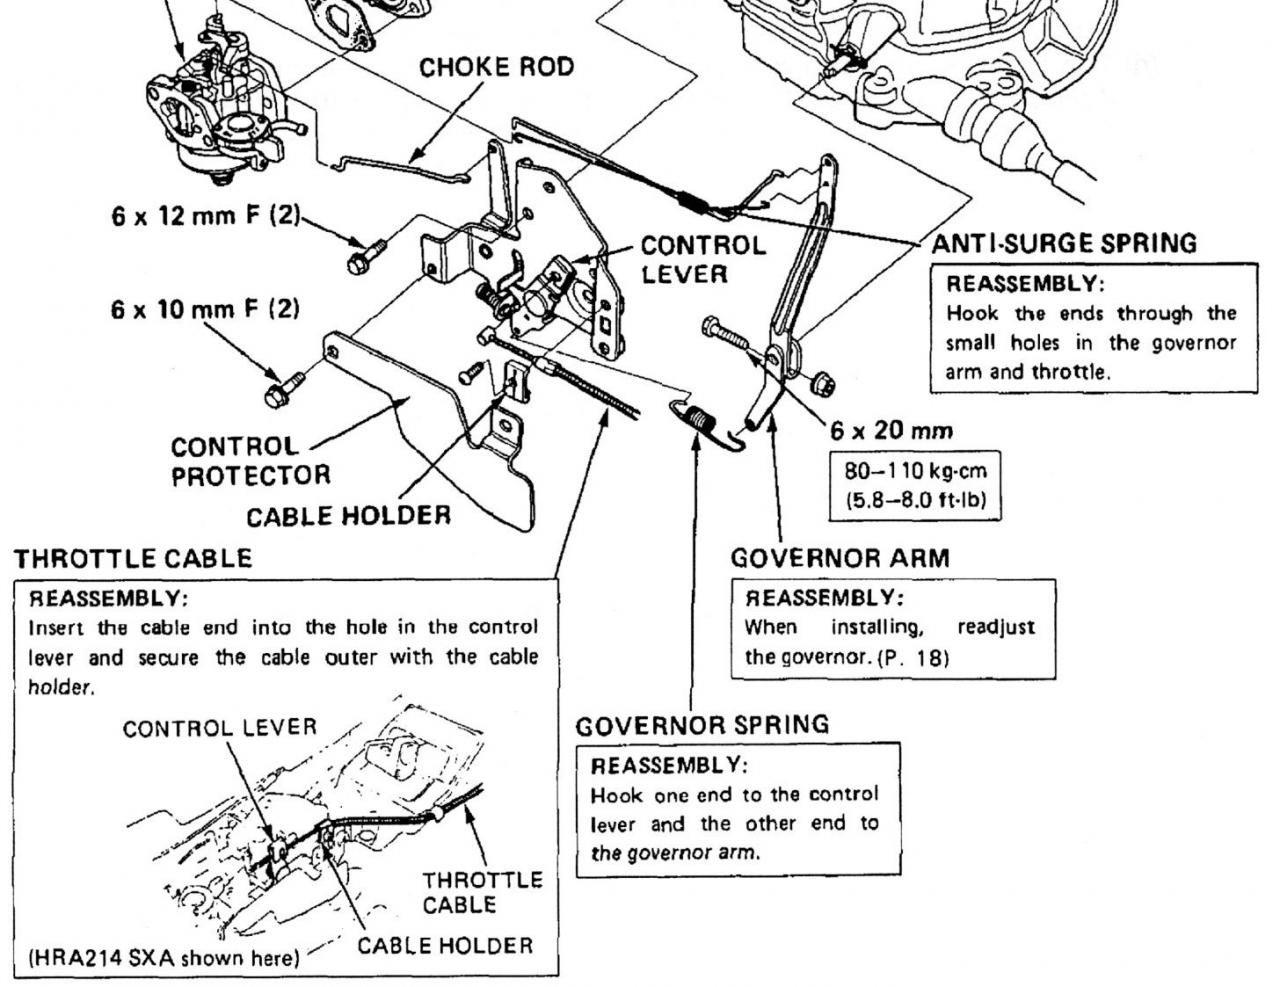 Briggs And Stratton Throttle Linkage Diagram Placement Briggs Carburetor Linkage Diagram Briggs Free Engine Imag Briggs Stratton Briggs Estimate Template